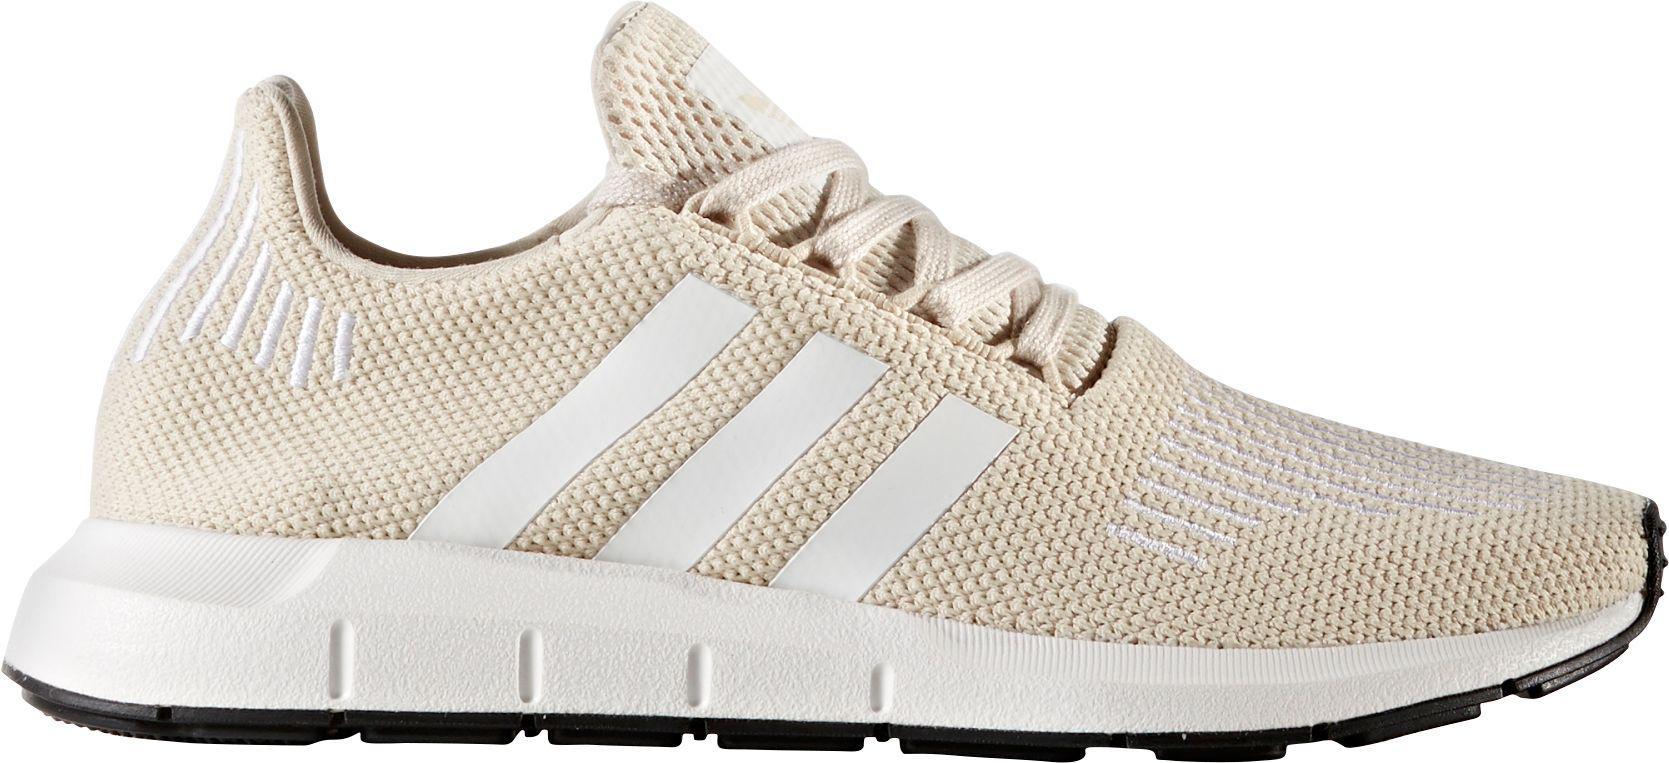 e414745e3fedc Adidas Originals - Multicolor Swift Run Running Shoes - Lyst